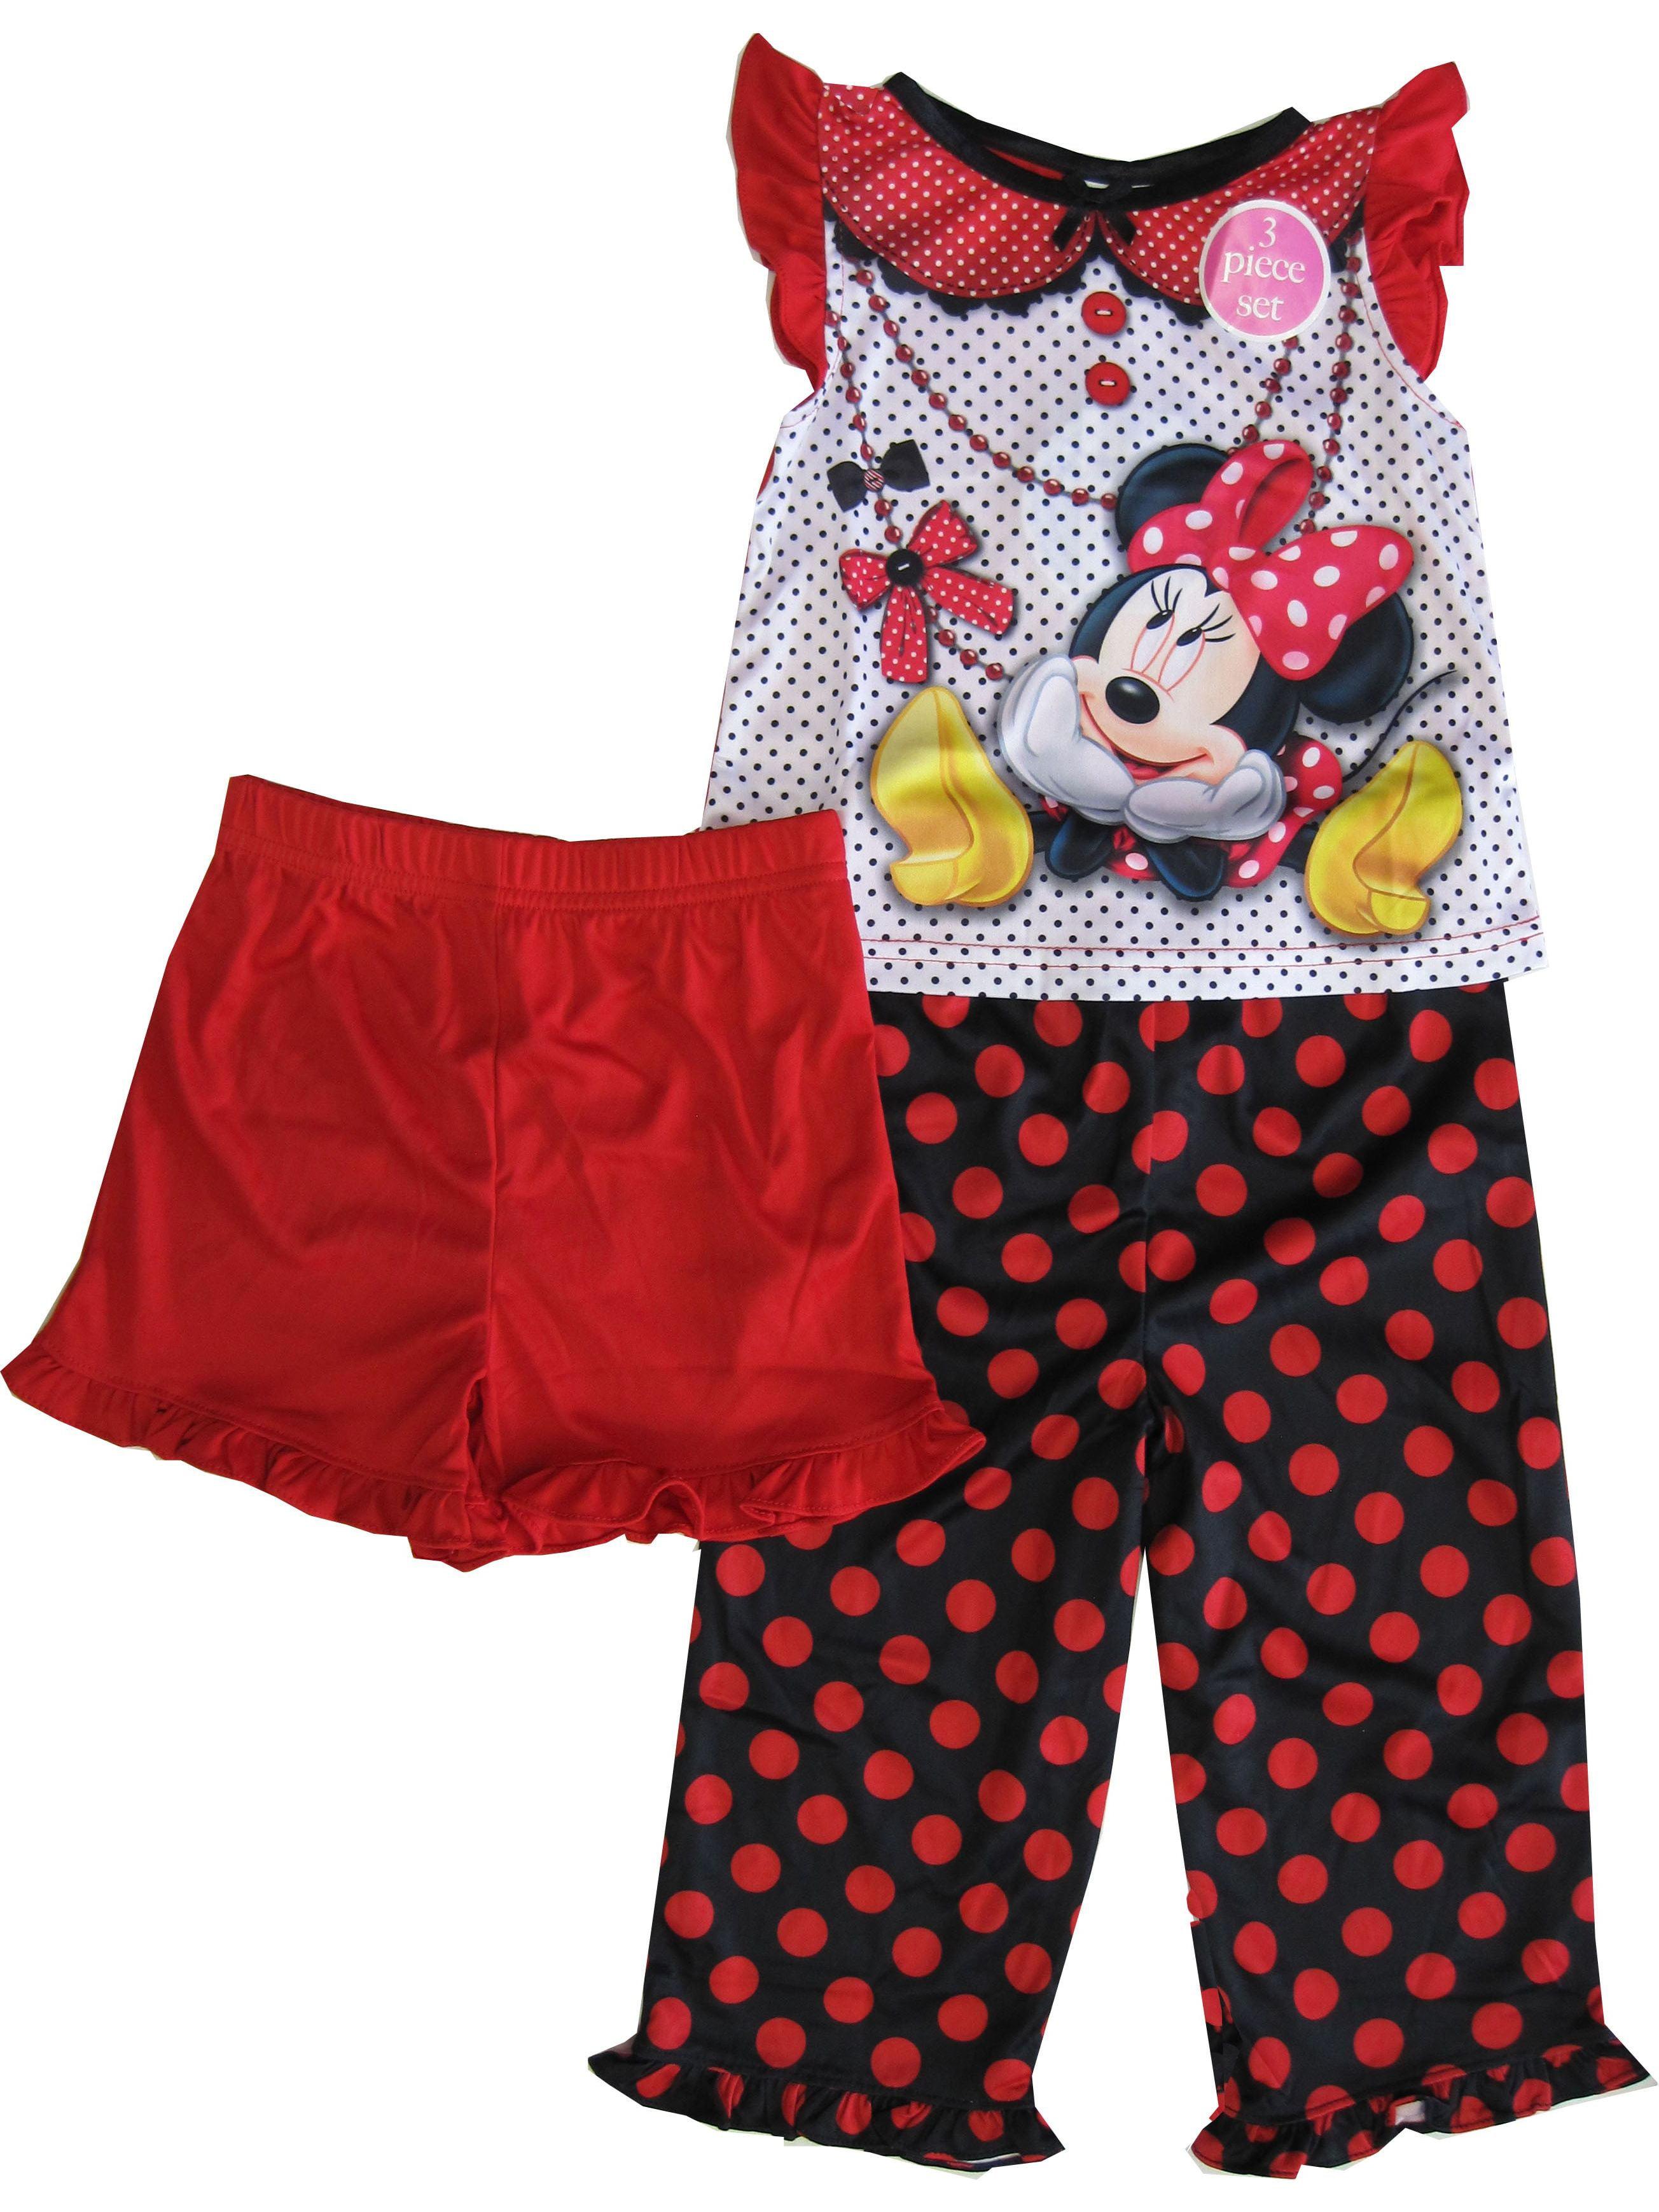 Disney Little Girls Black Red Polka Dot Minnie Print 3 Pc Pajama Set 2-4T